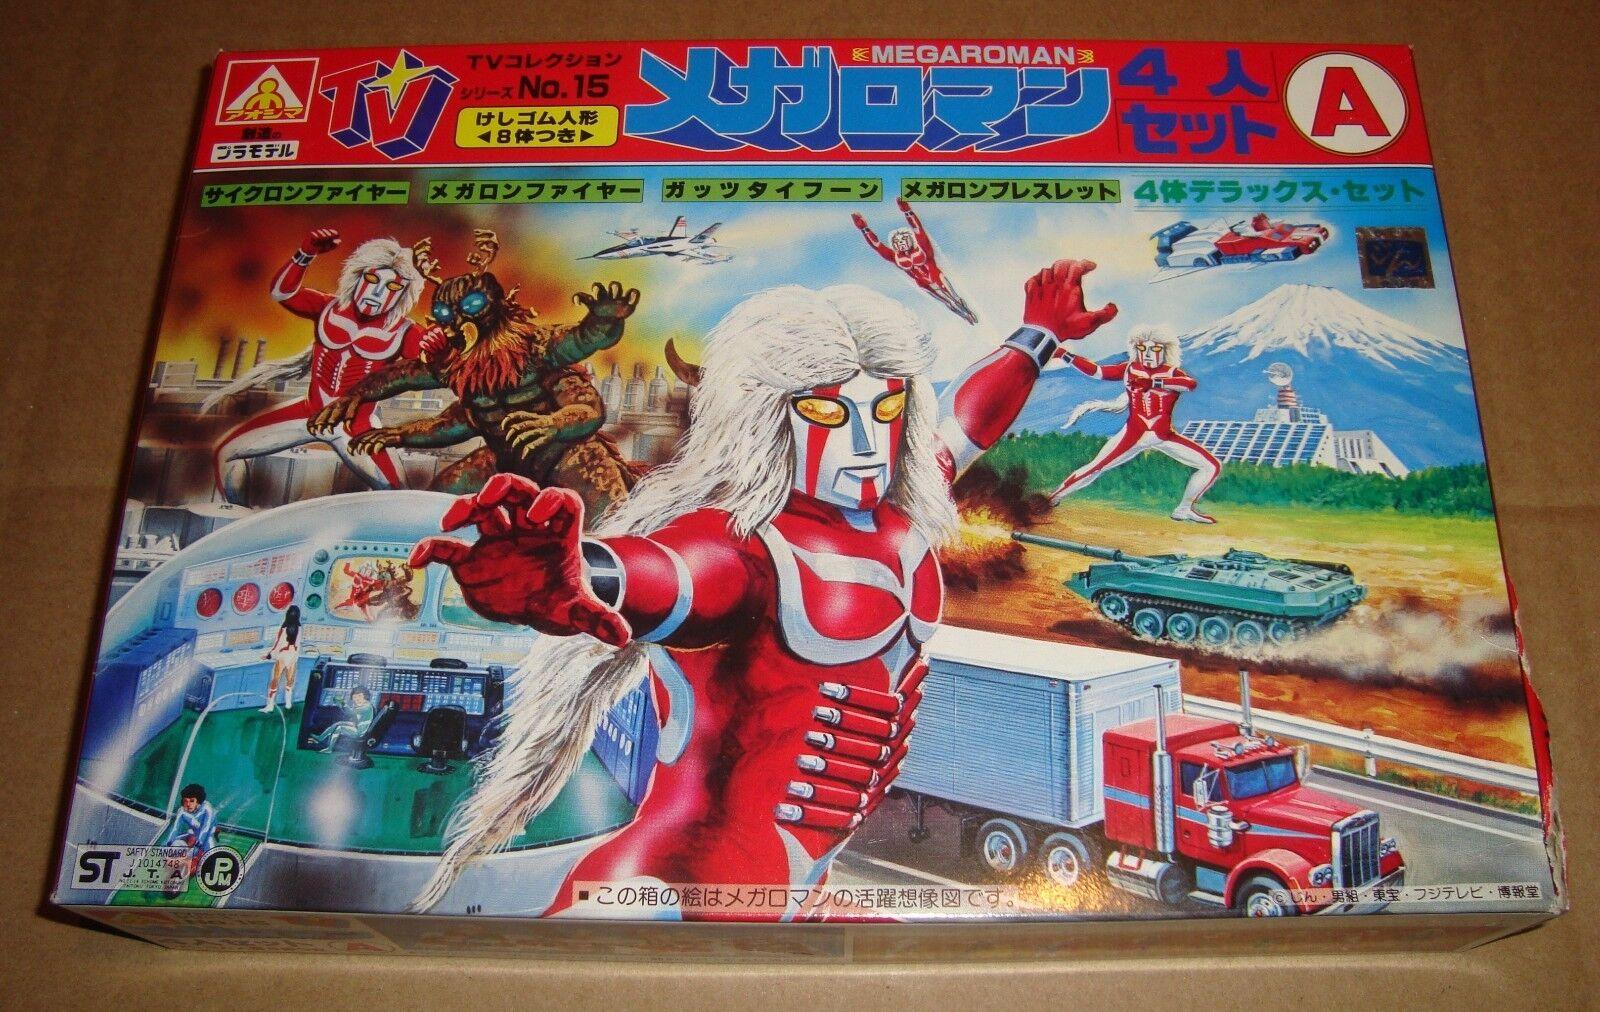 AOSHIMA TV COLLECTION No.15 MEGALOMAN PLASTIC KIT AOSHIMA 1979